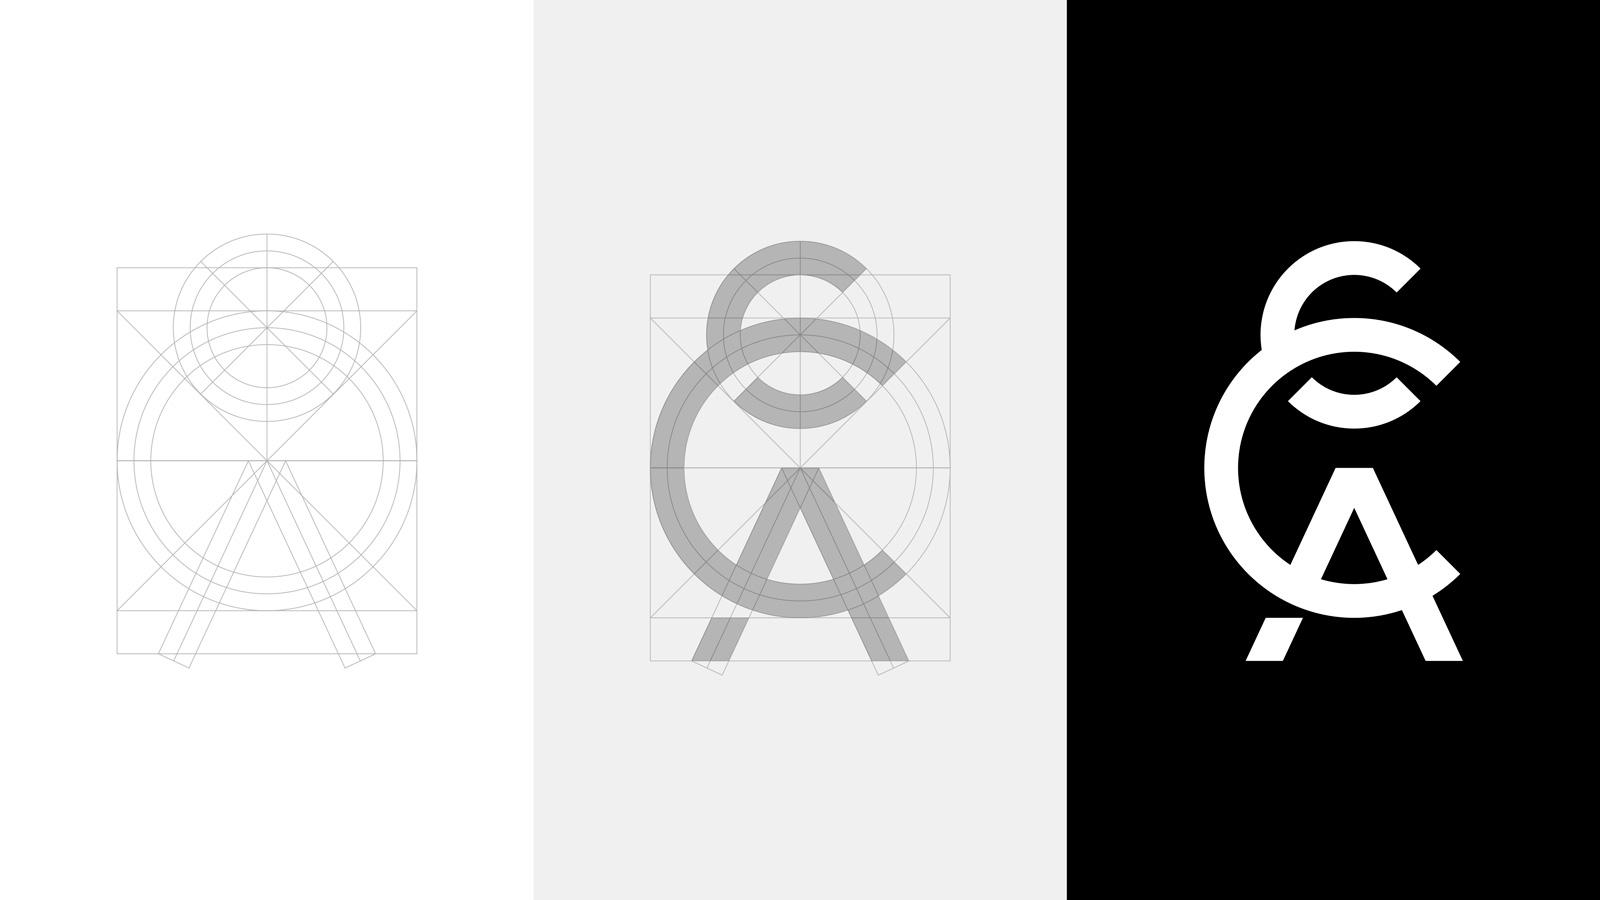 cca-logo-3